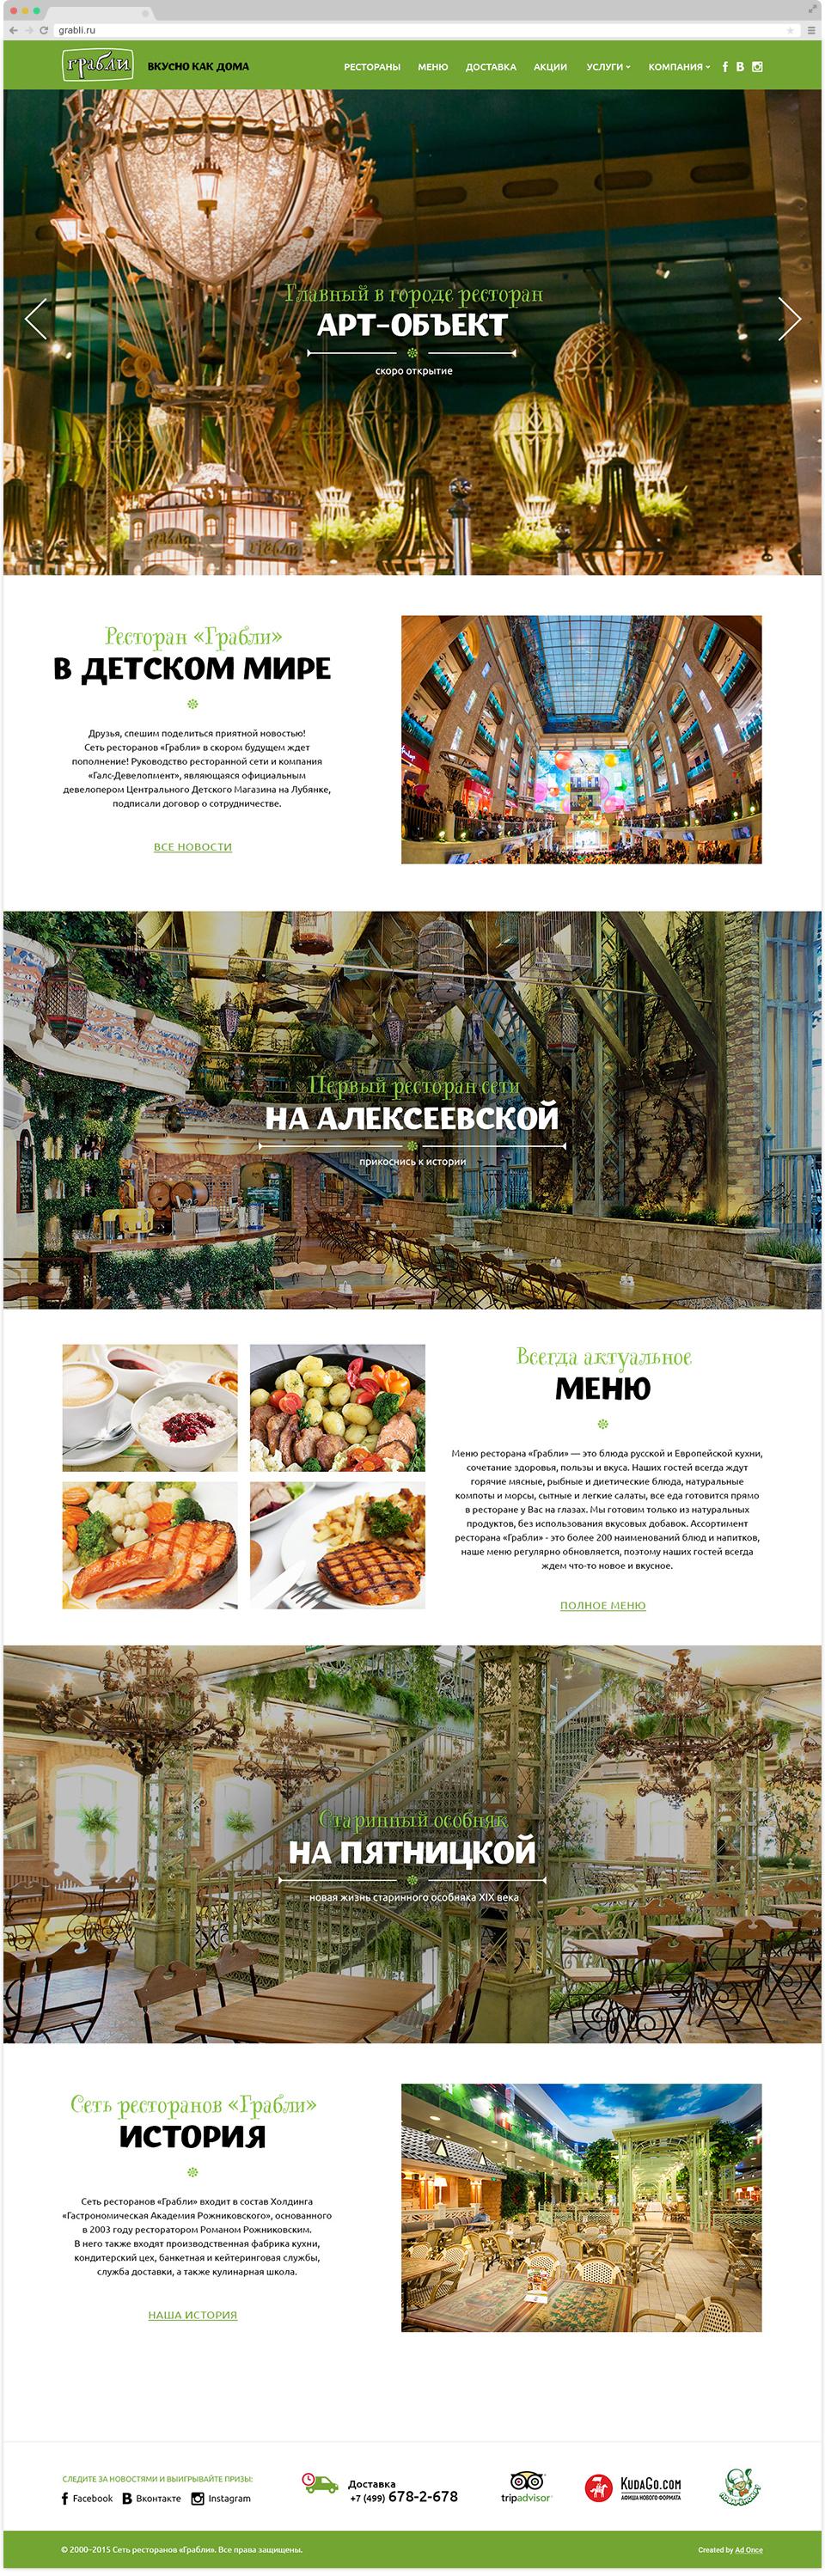 Концепция дизайна сайта кафе